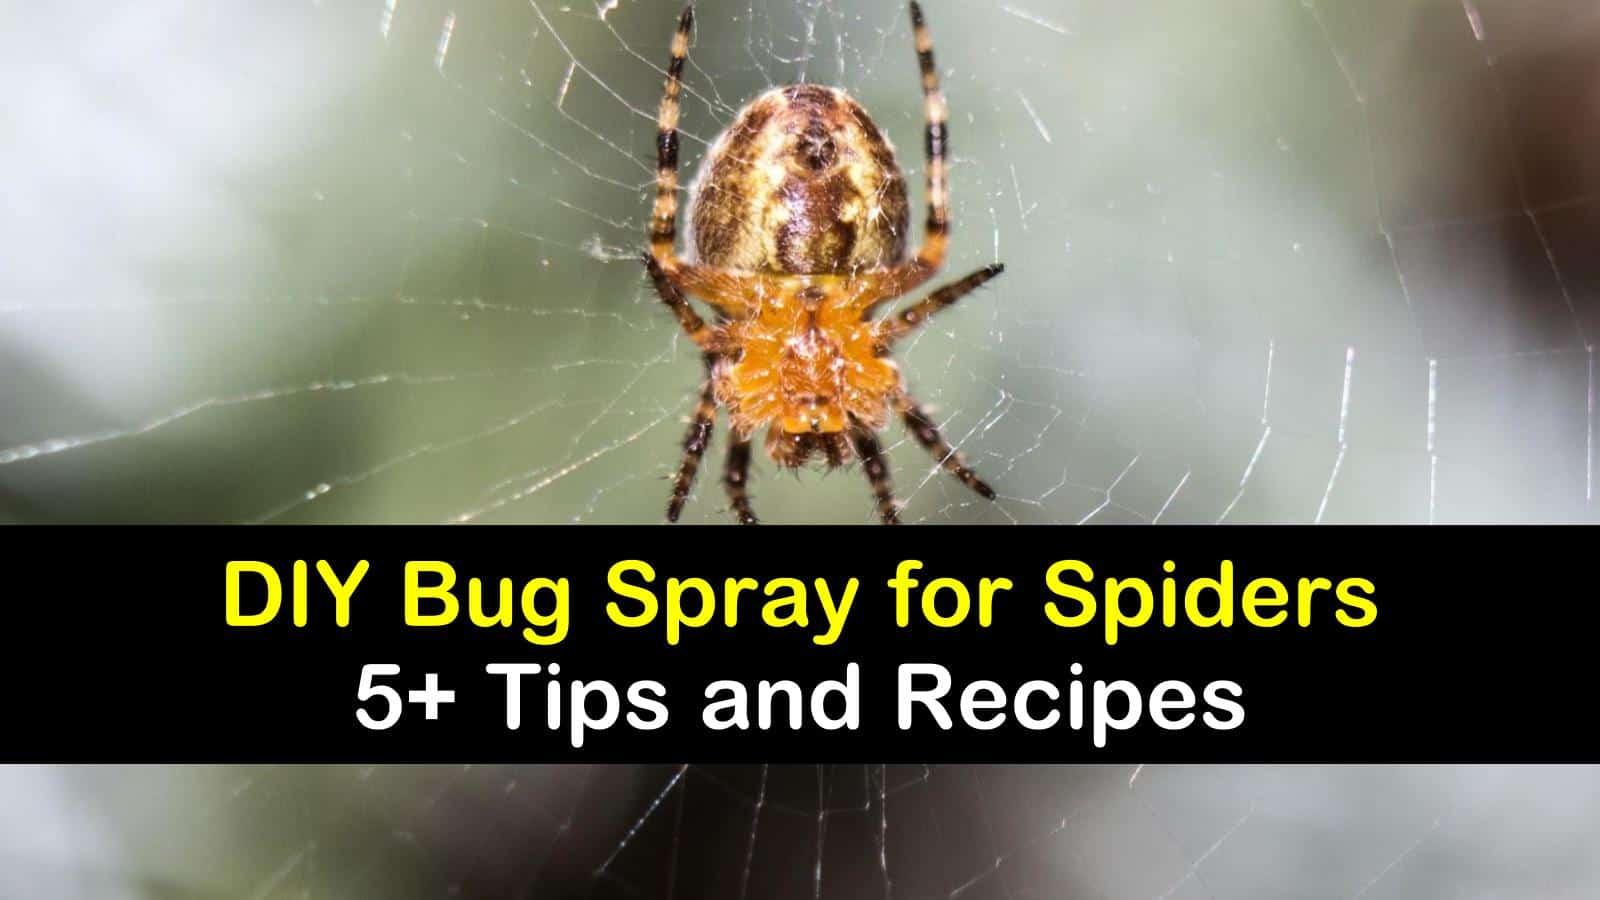 DIY bug spray for spiders titleimg1